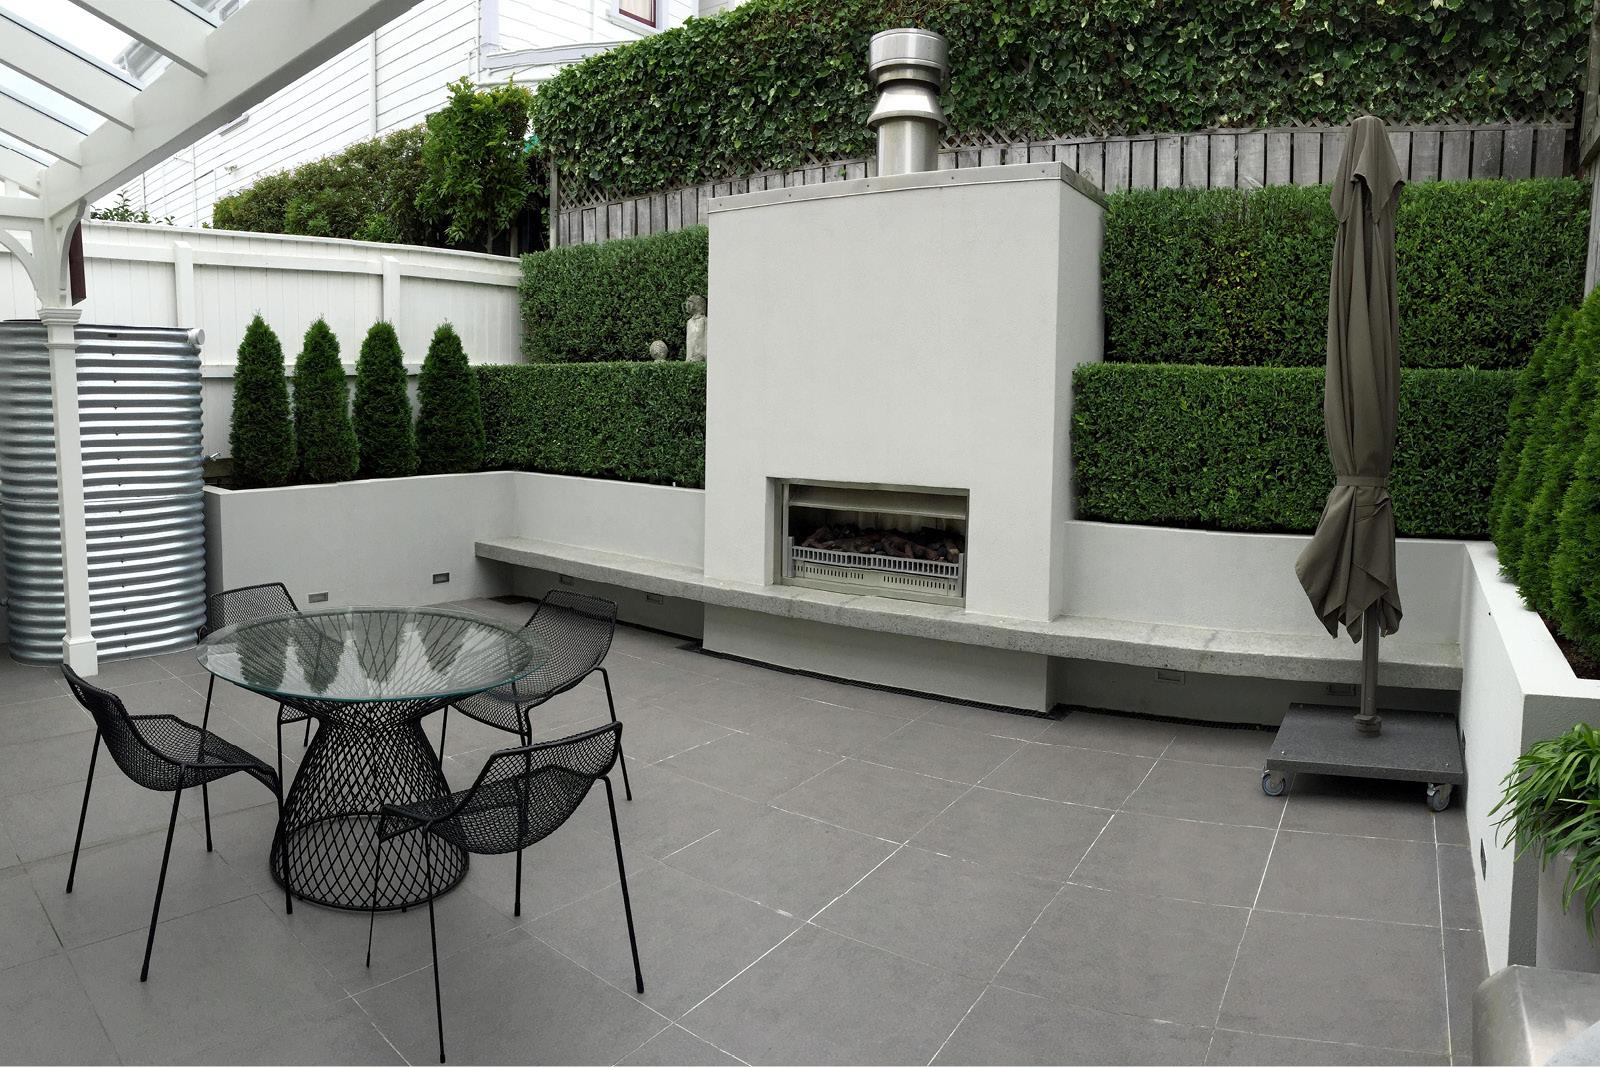 Urban_Courtyard_Formal_Garden_MNLA_3.jpg